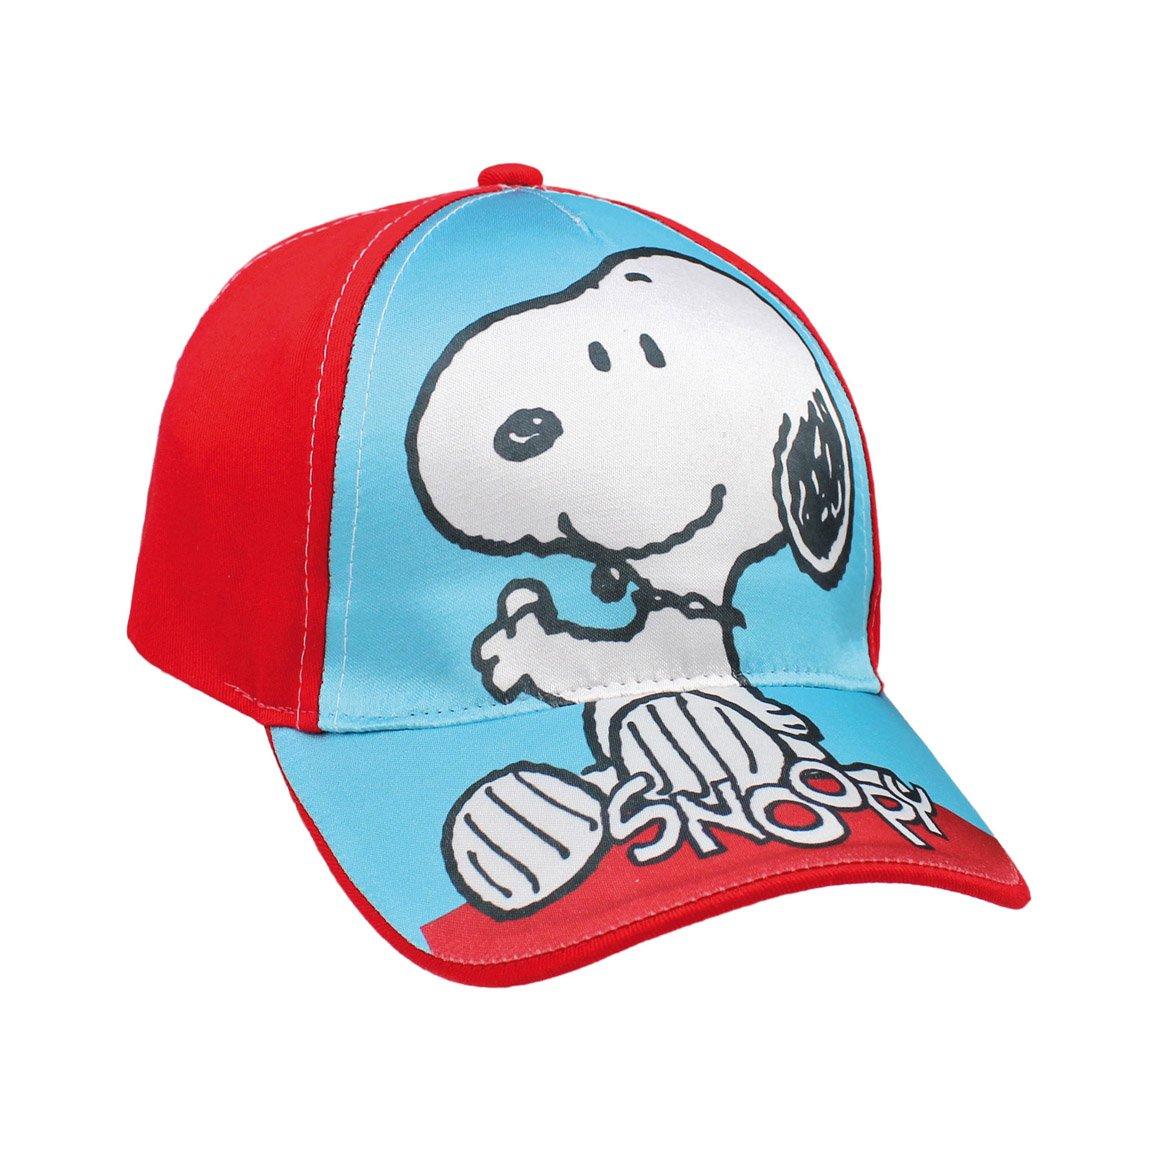 Cap Snoopy Premium Kappe Gr.54 Base-Cap 2200-256